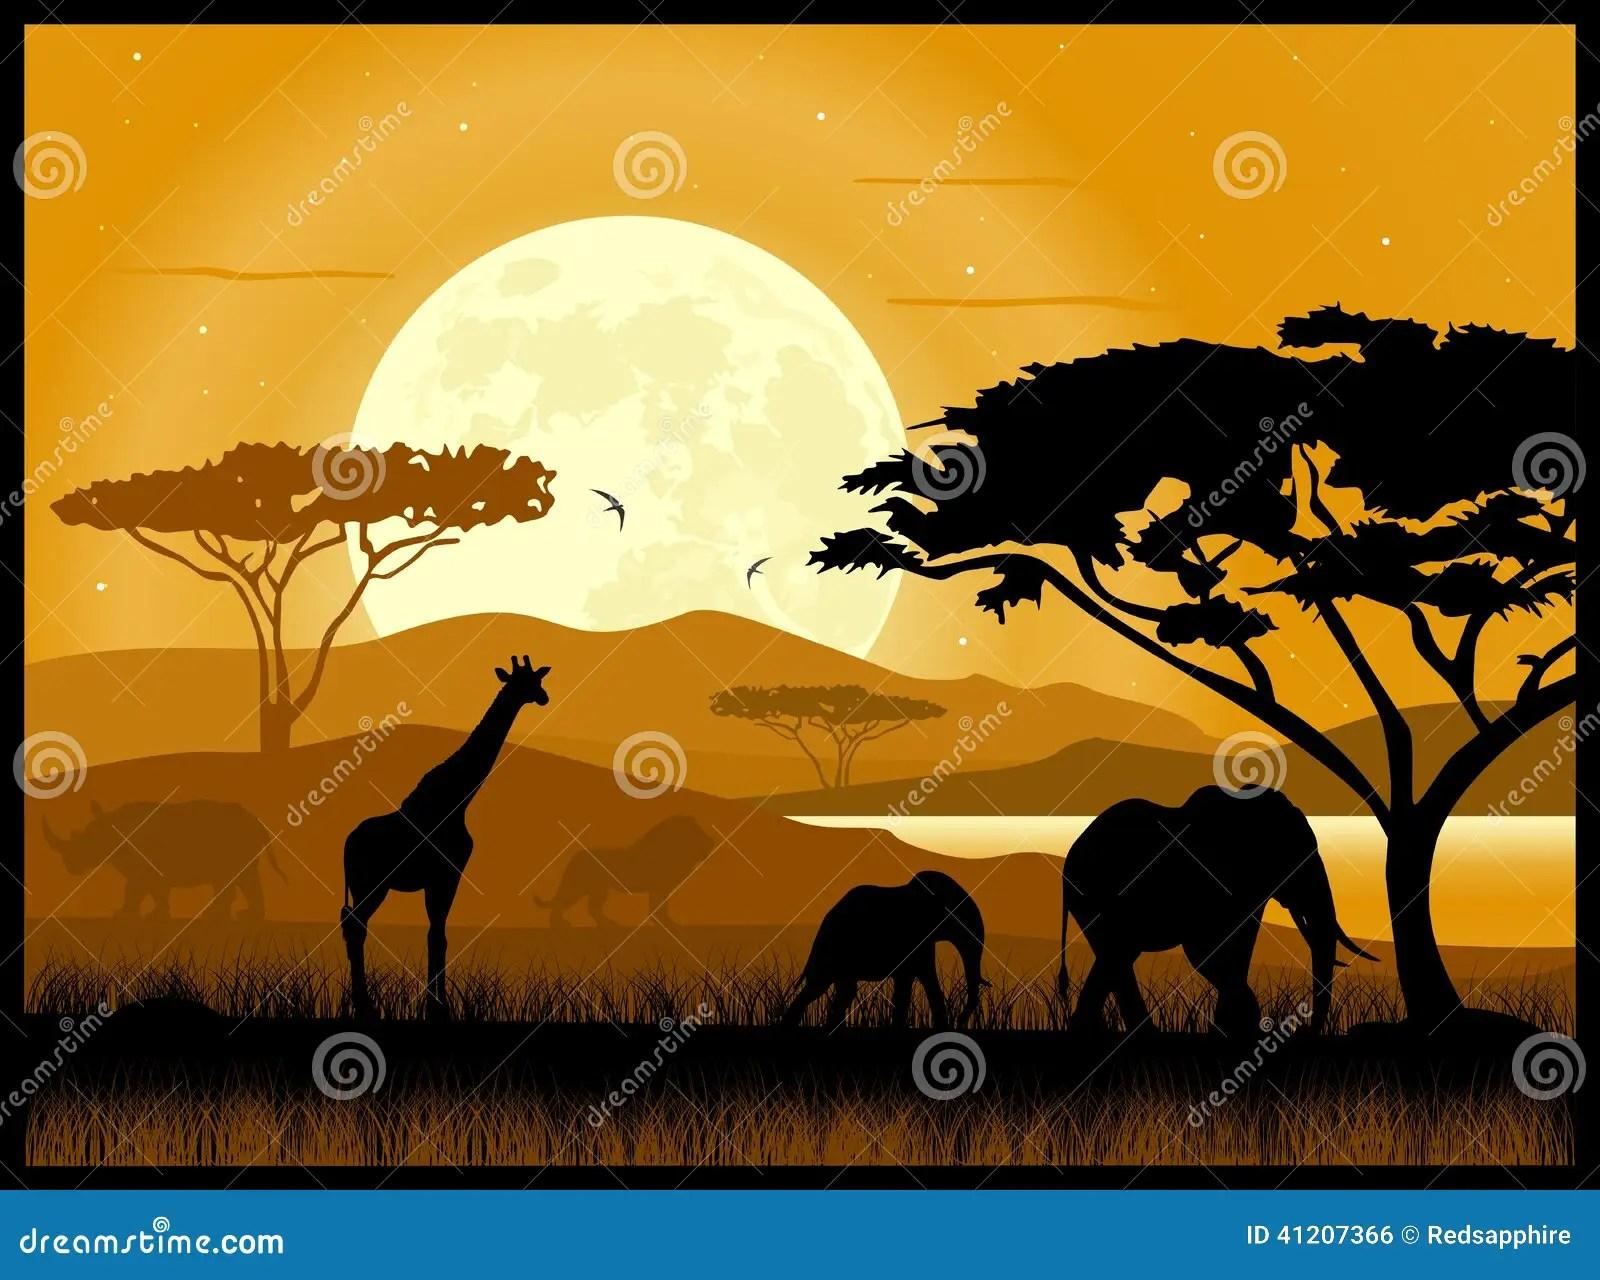 Safari Animal Wallpaper La Savane Africaine Illustration De Vecteur Image Du